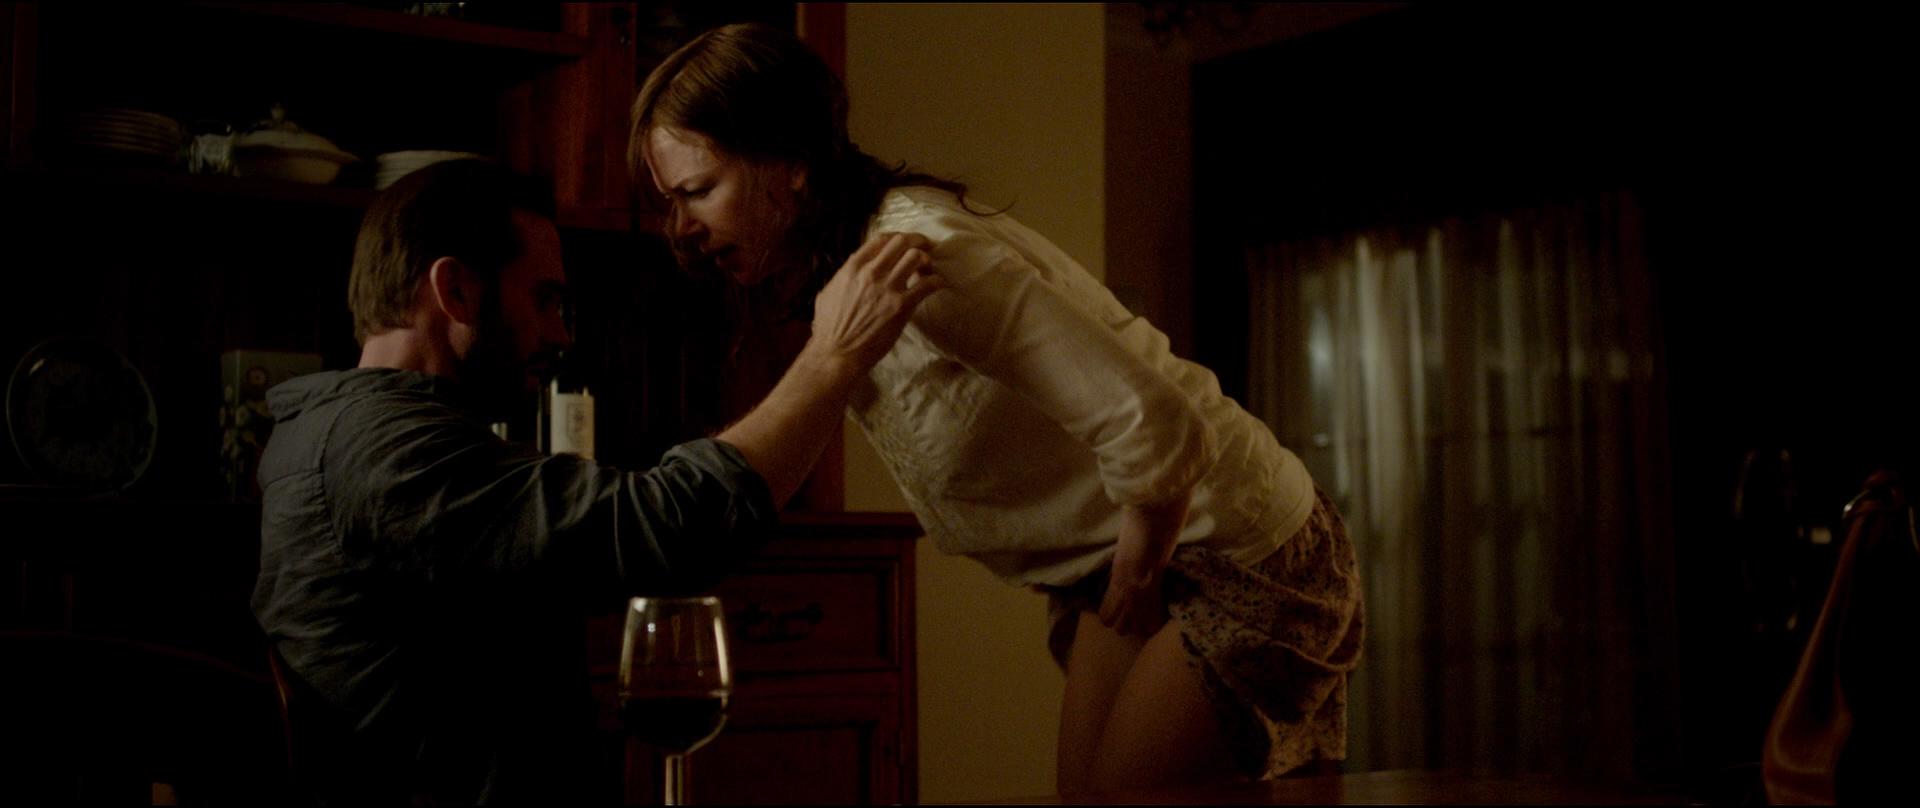 Nicole Kidman nude full frontal or bd and Madisson Brown hot - Strangerland (2015) hd1080p BluRay (9)